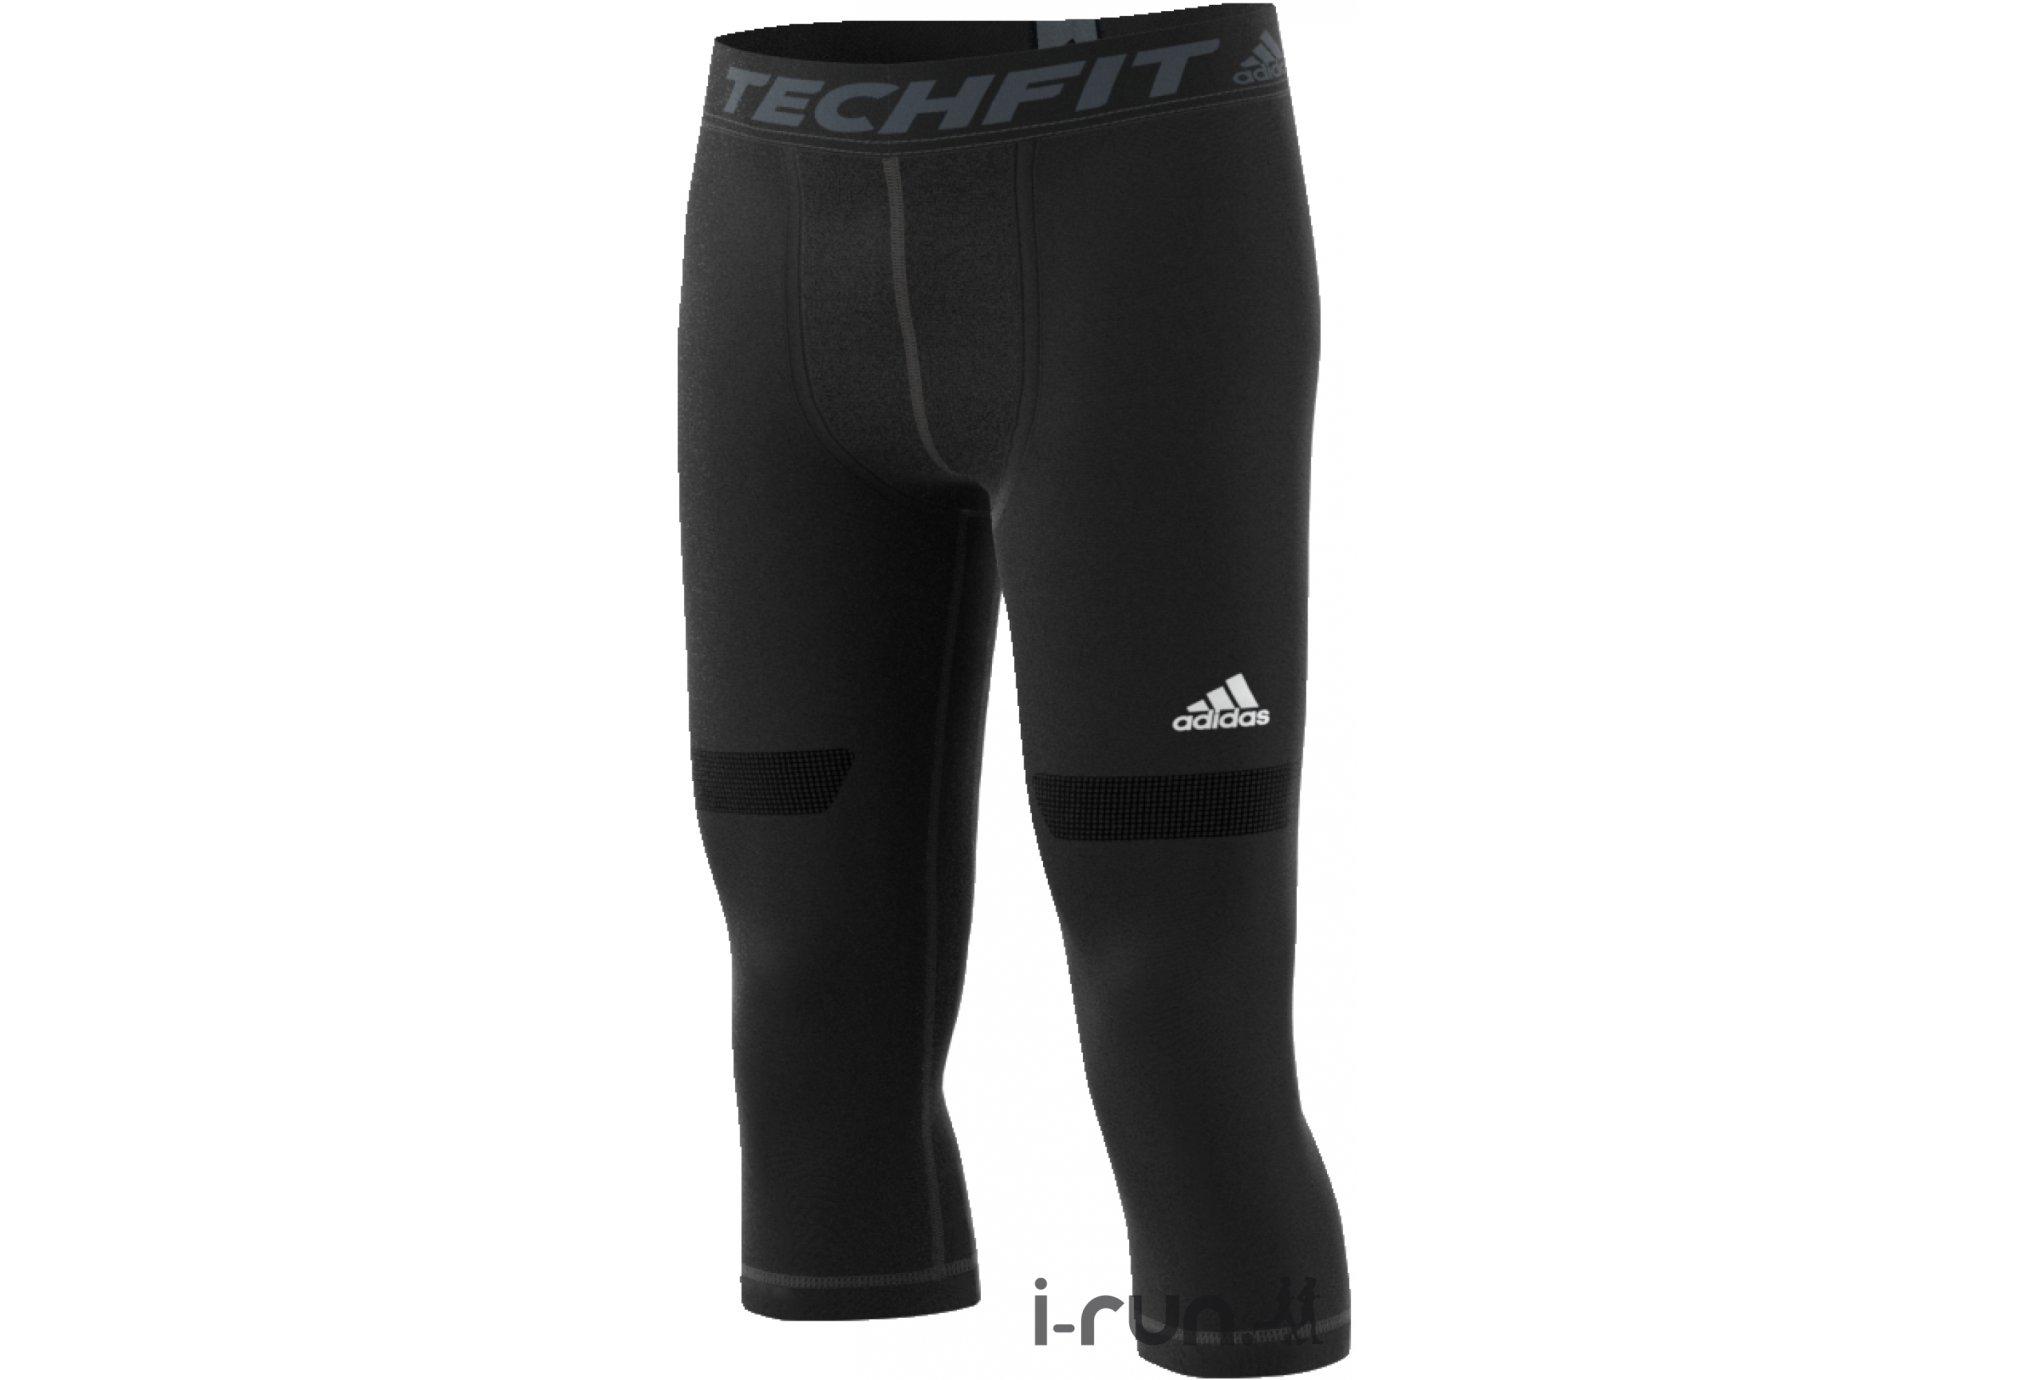 Adidas Collant 3/4 techfit chill m vêtement running homme